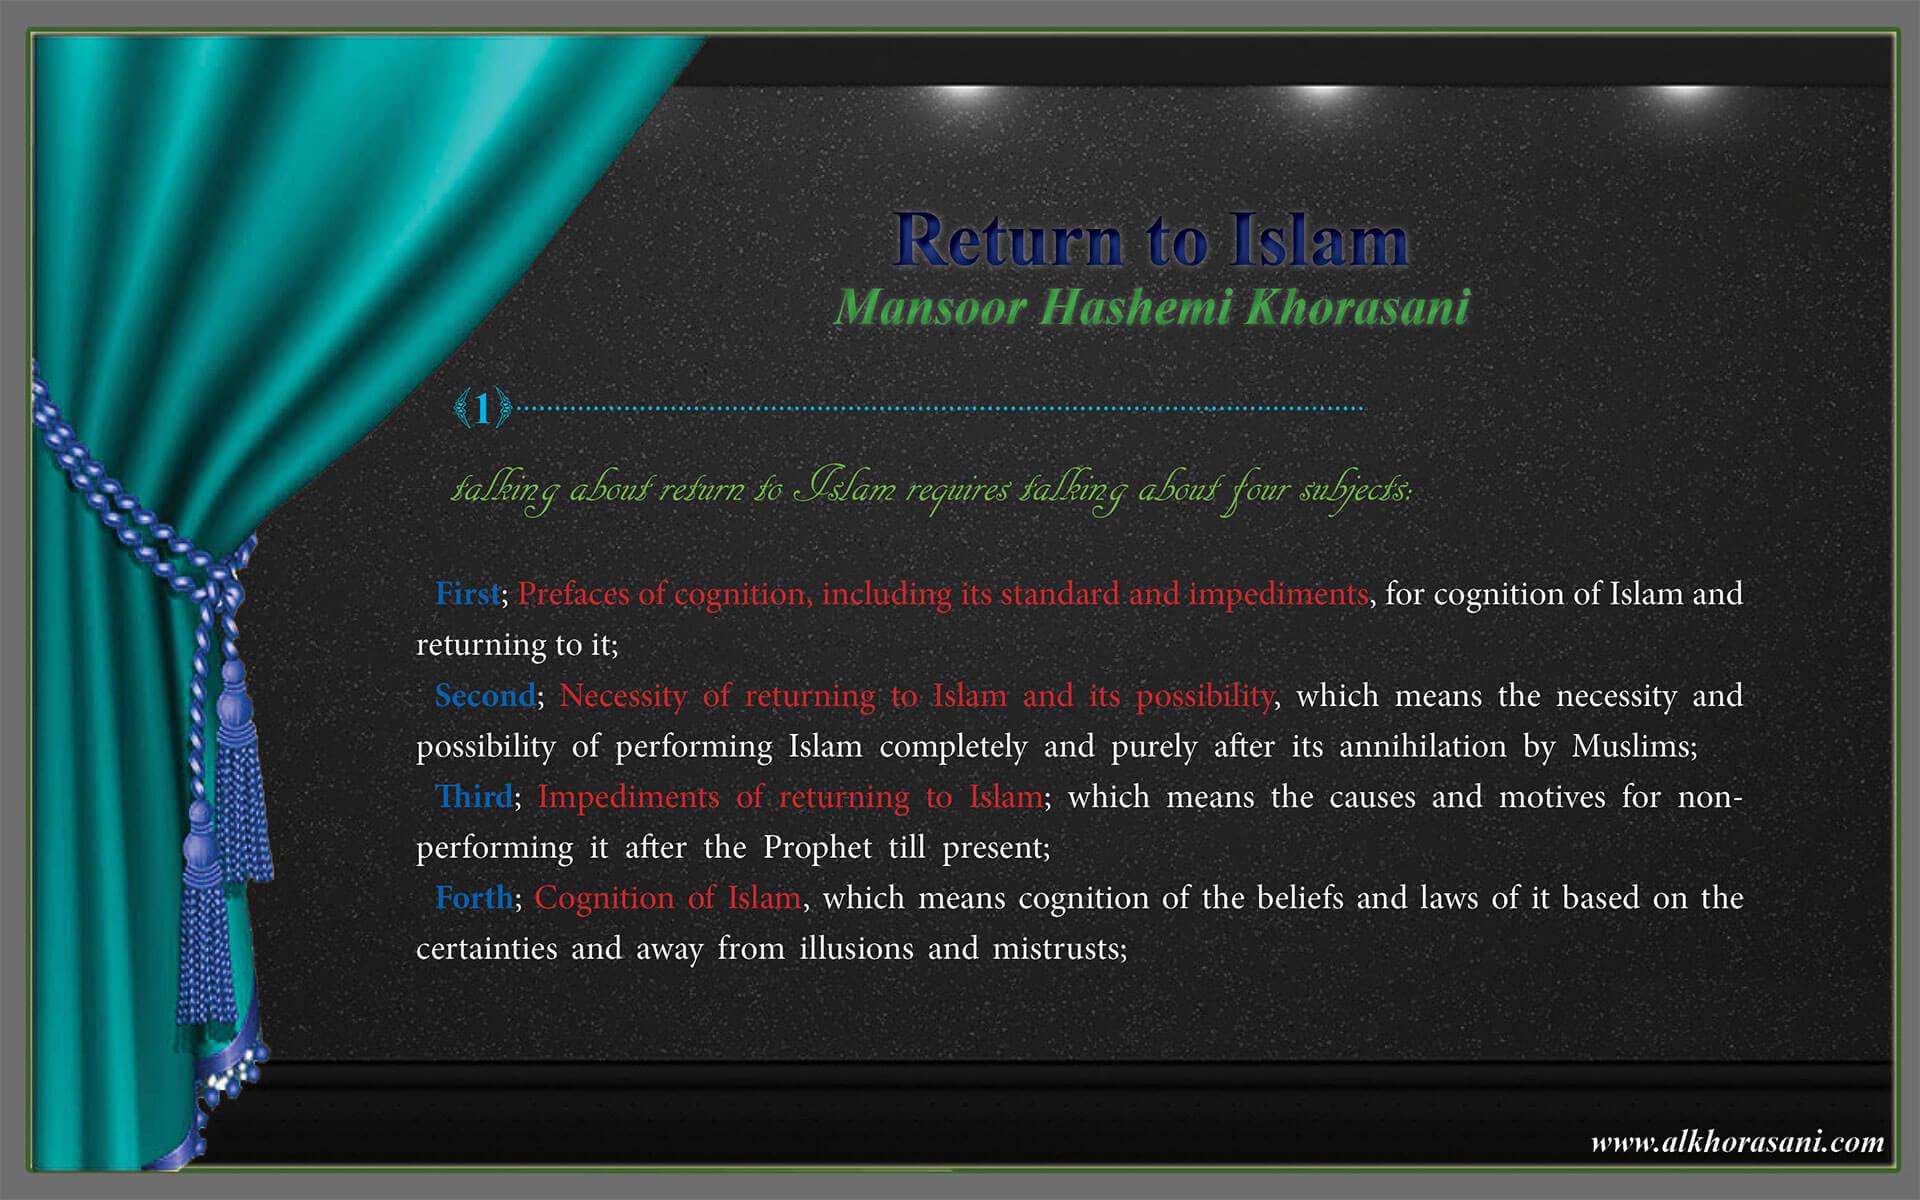 Foreword; Return to Islam